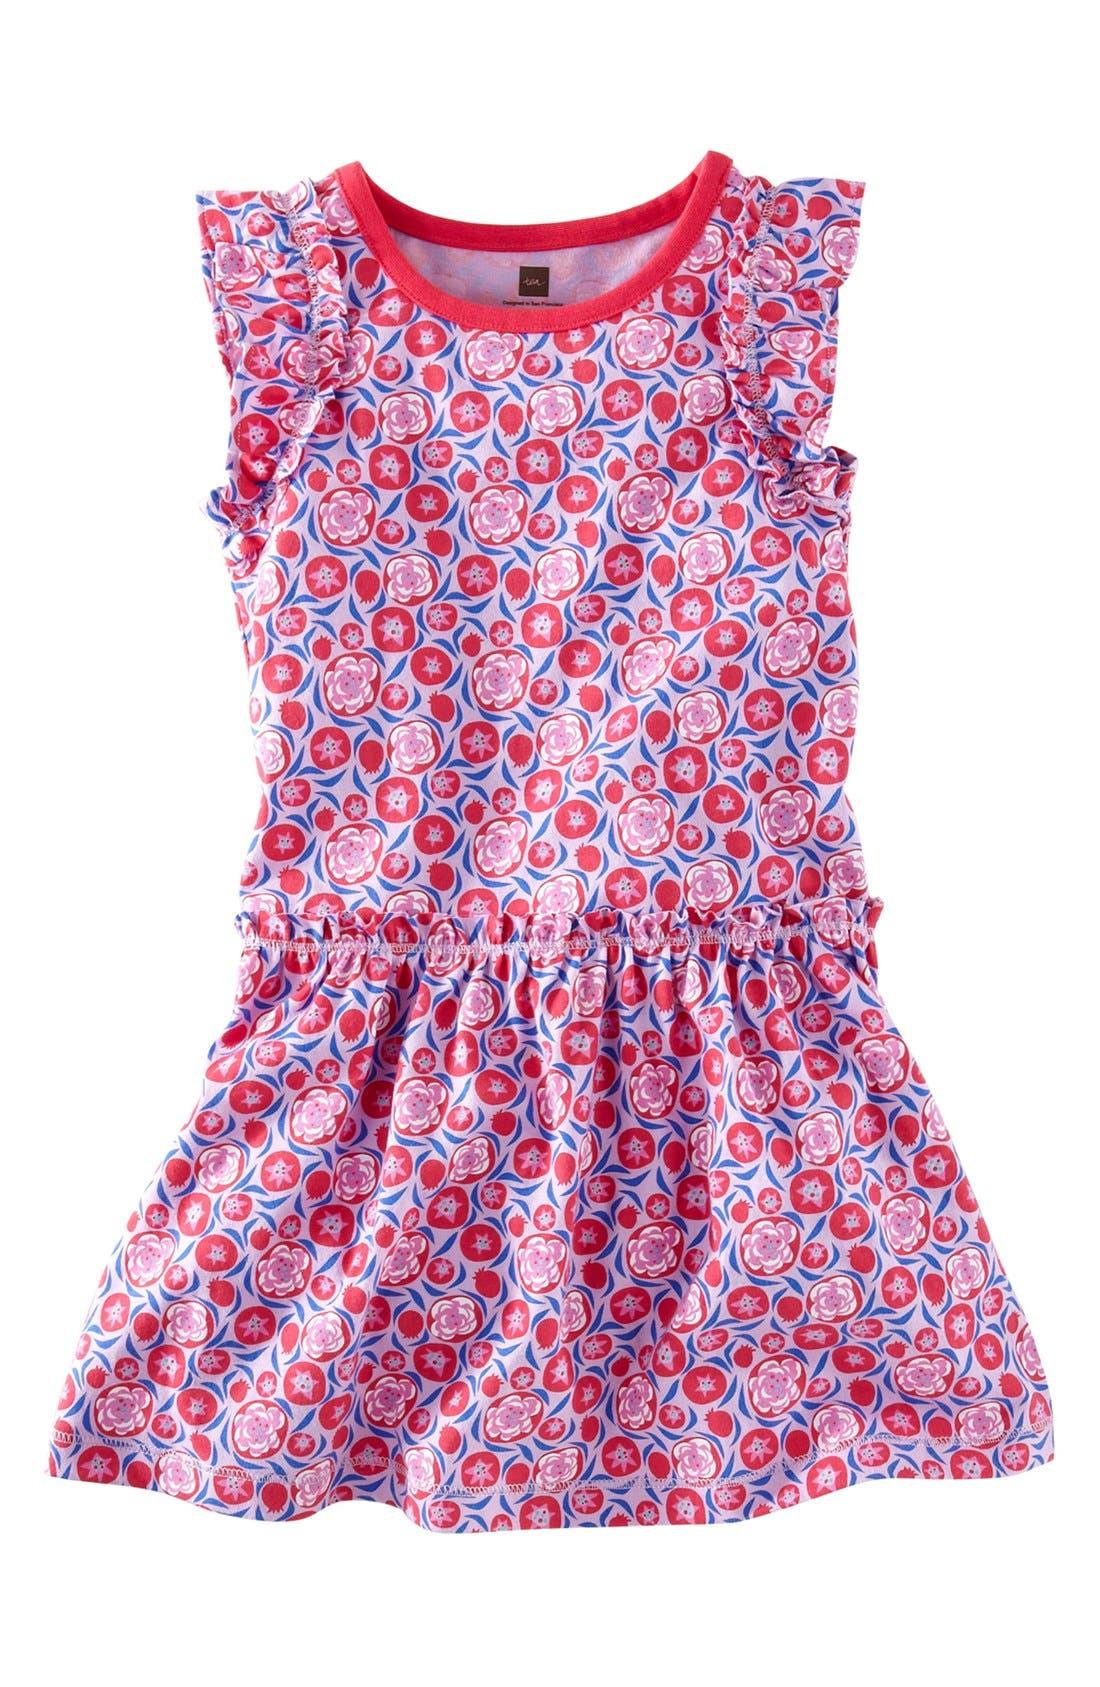 'Pomegranate' Flutter Dress,                             Main thumbnail 1, color,                             535